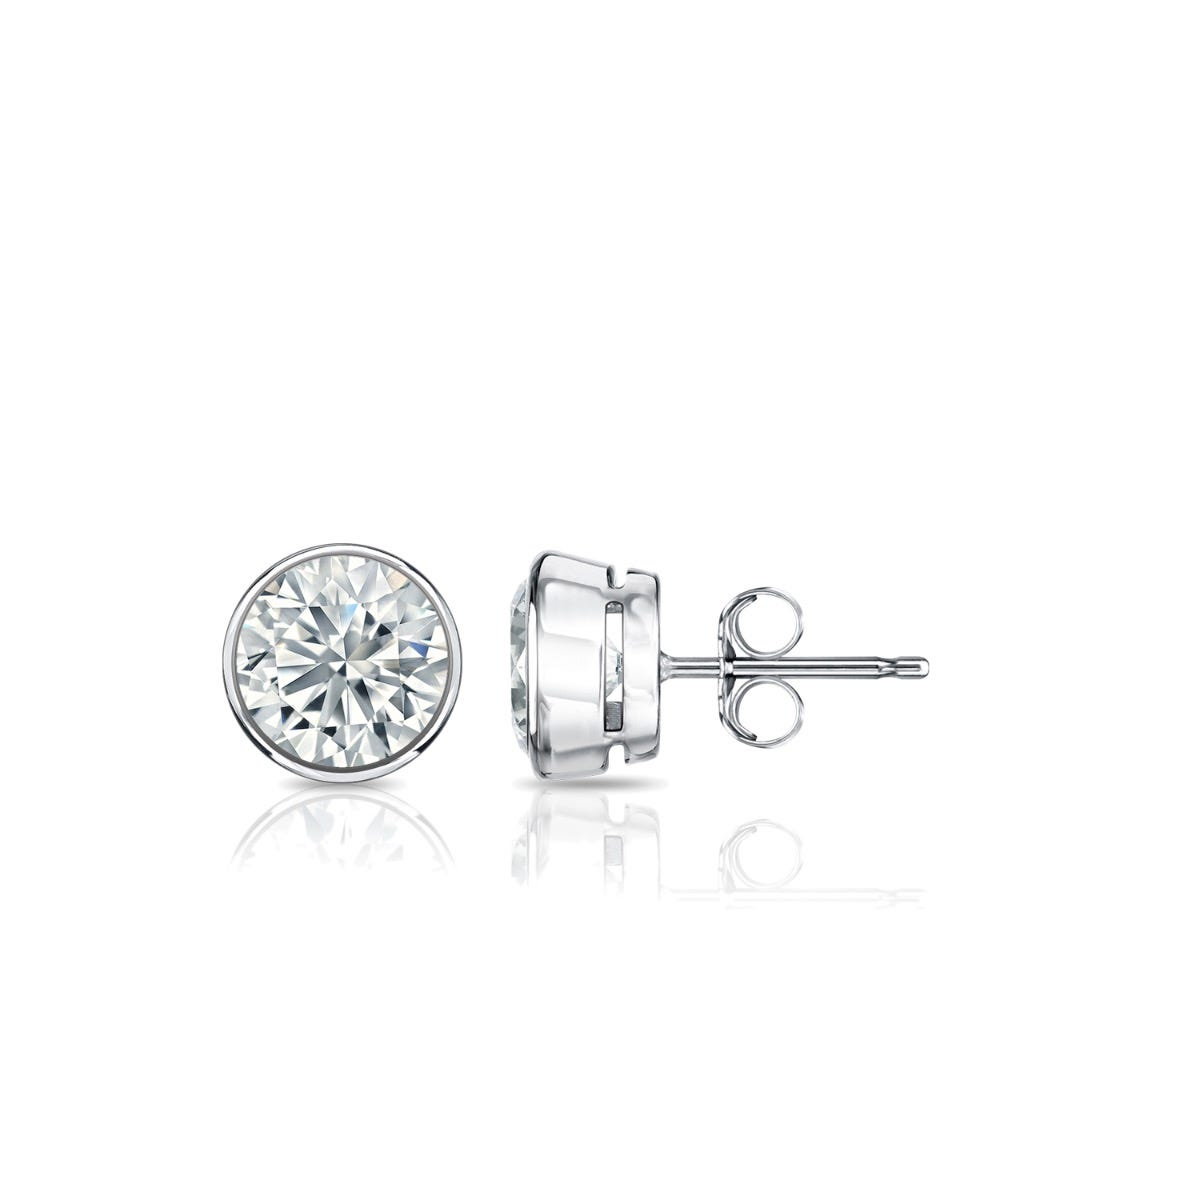 Diamond Round Bezel-Set 5/8ctw. Solitaire Stud (IJ-I2) Earrings in Platinum